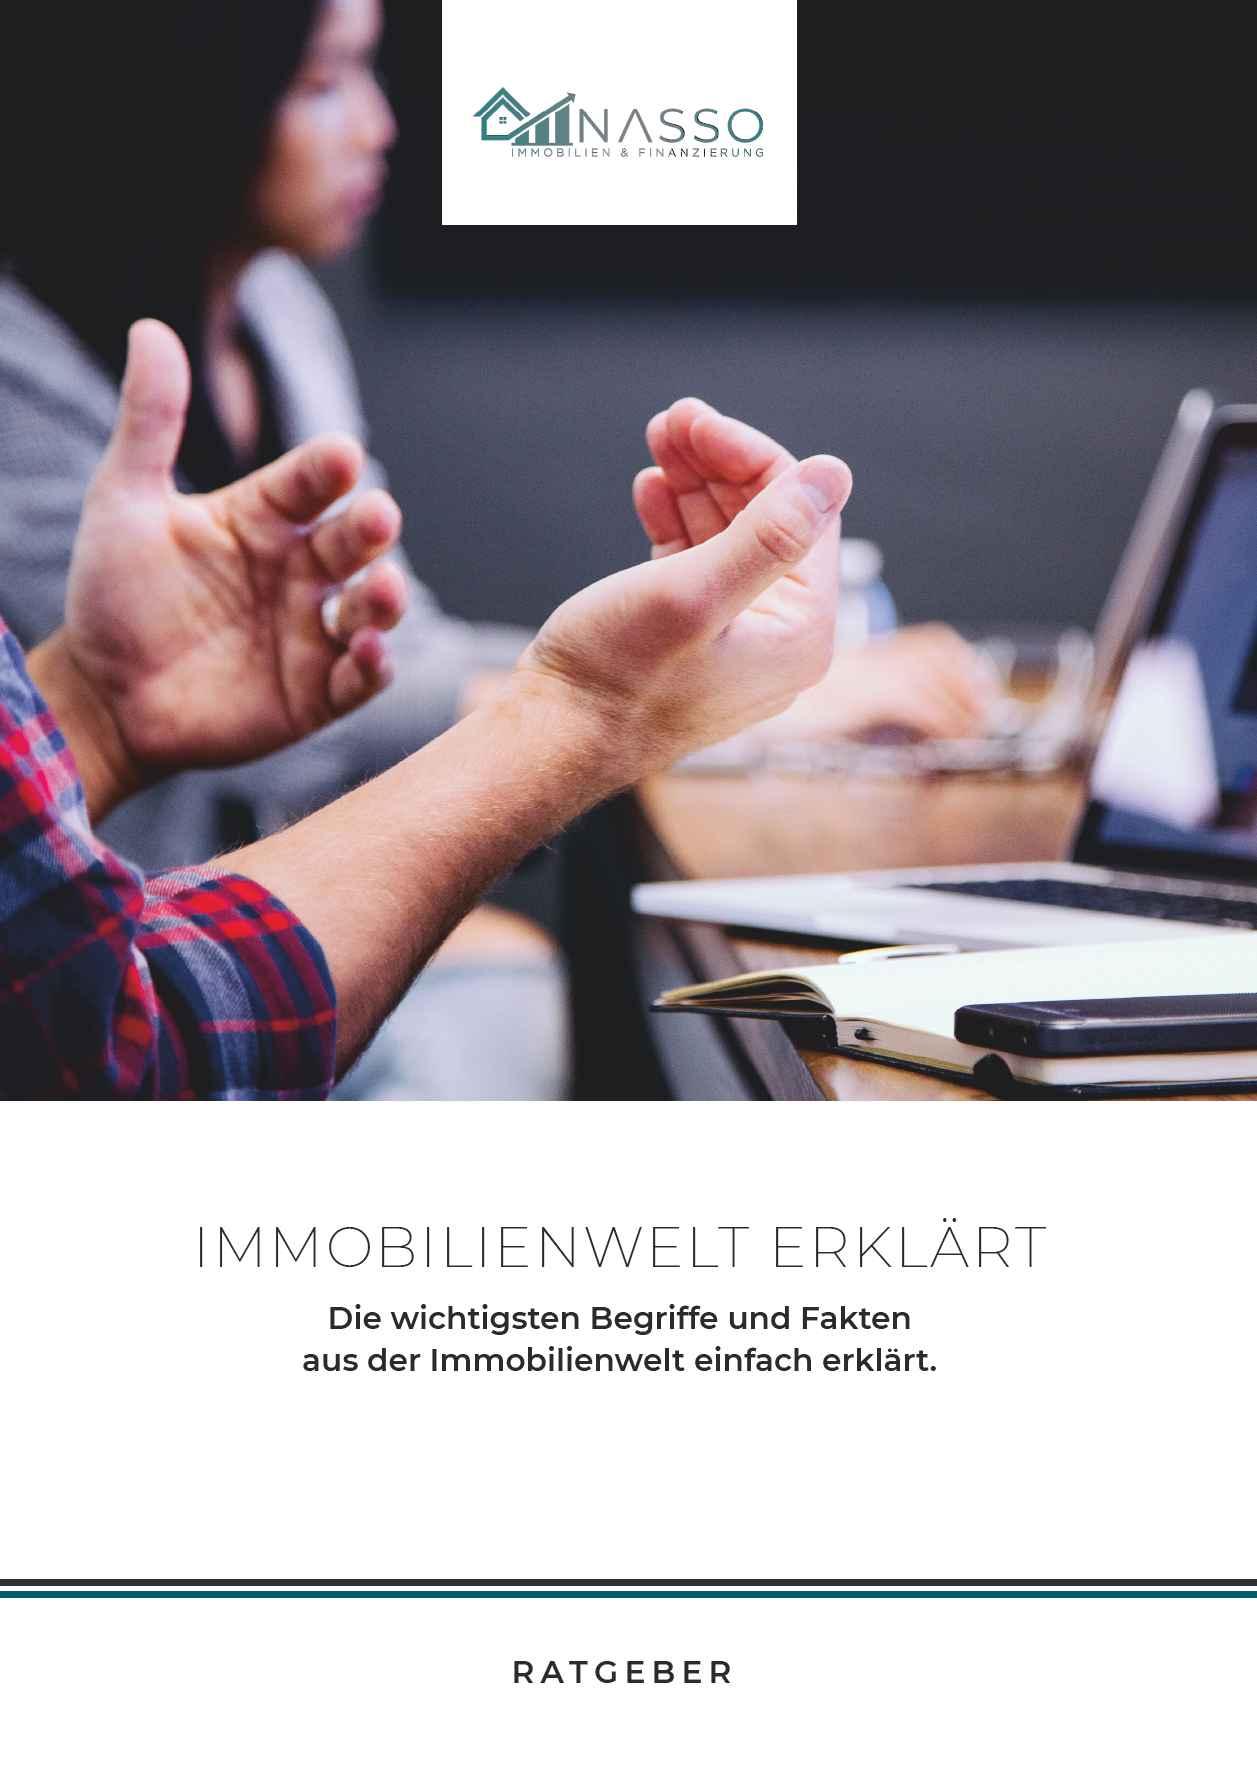 immonasso-ratgeber-cover-immobilienwelt